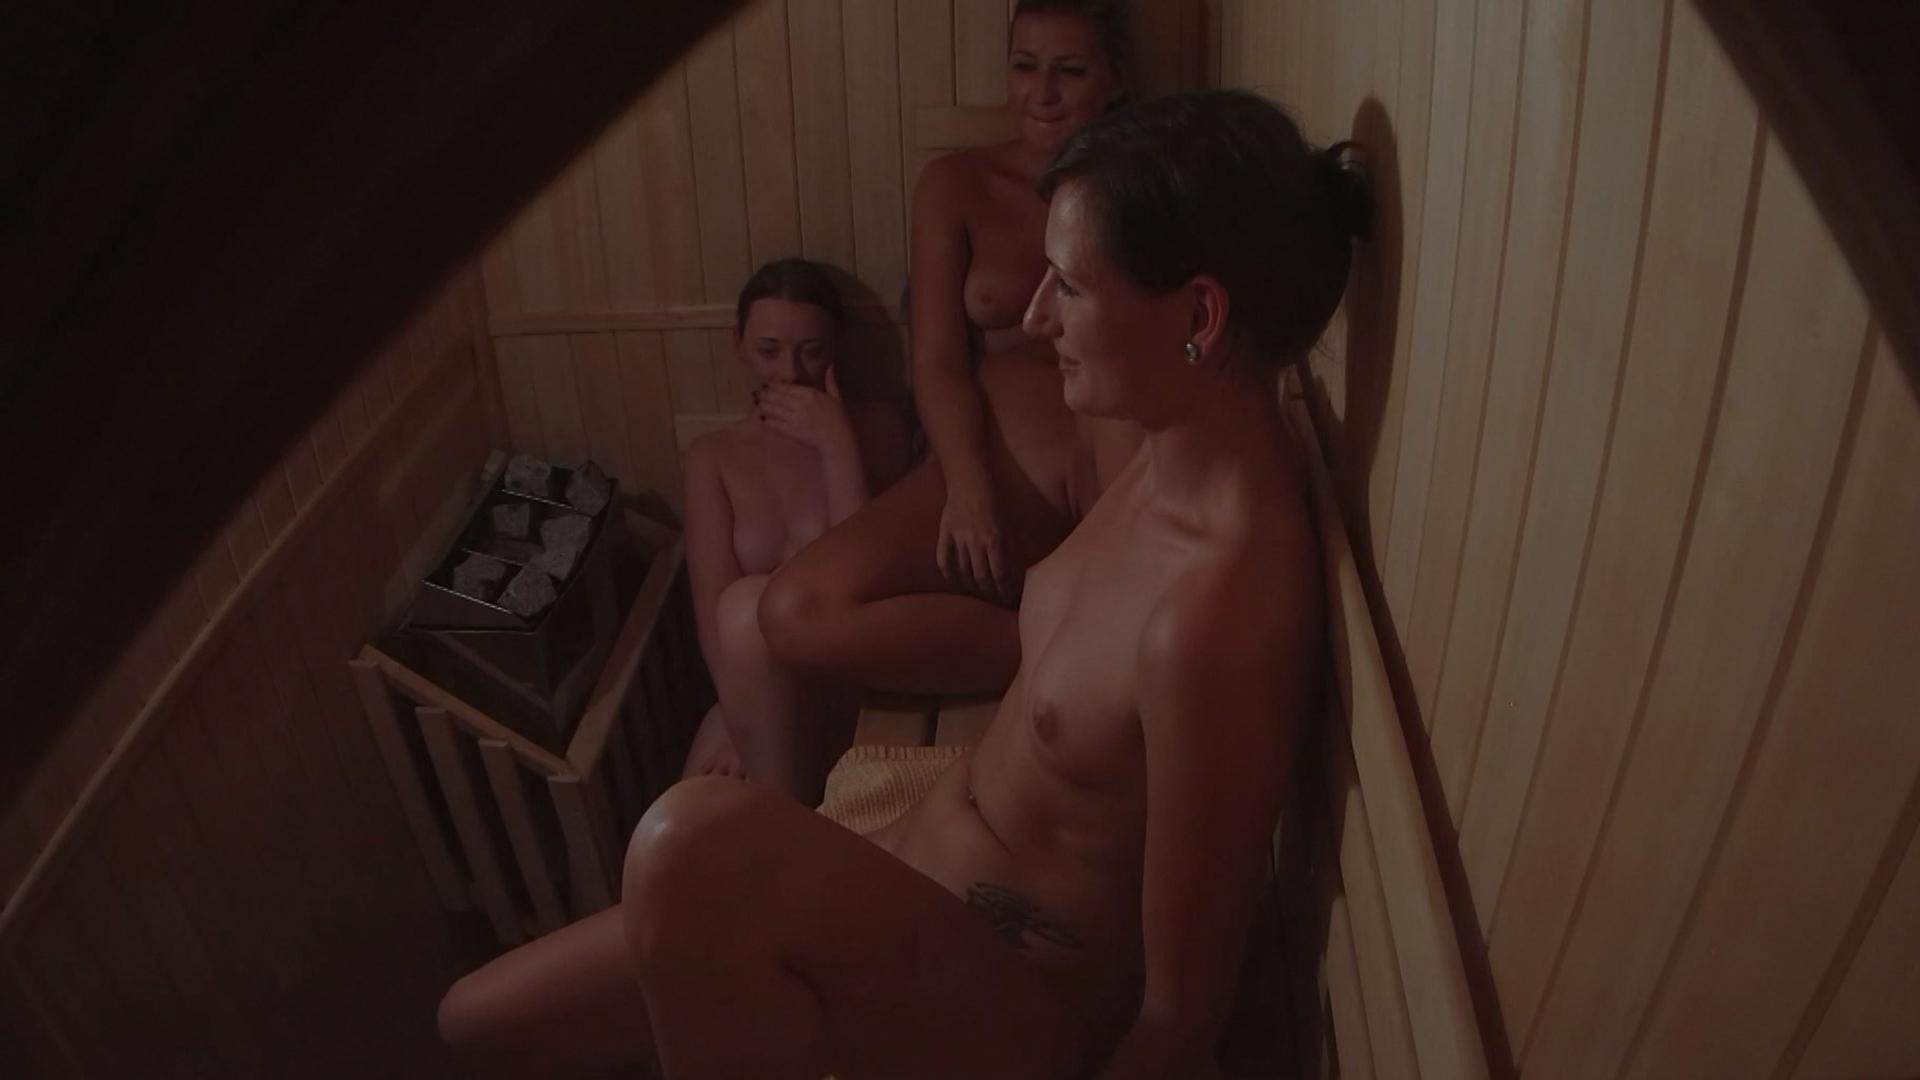 Скрытые камеры в сауне порно